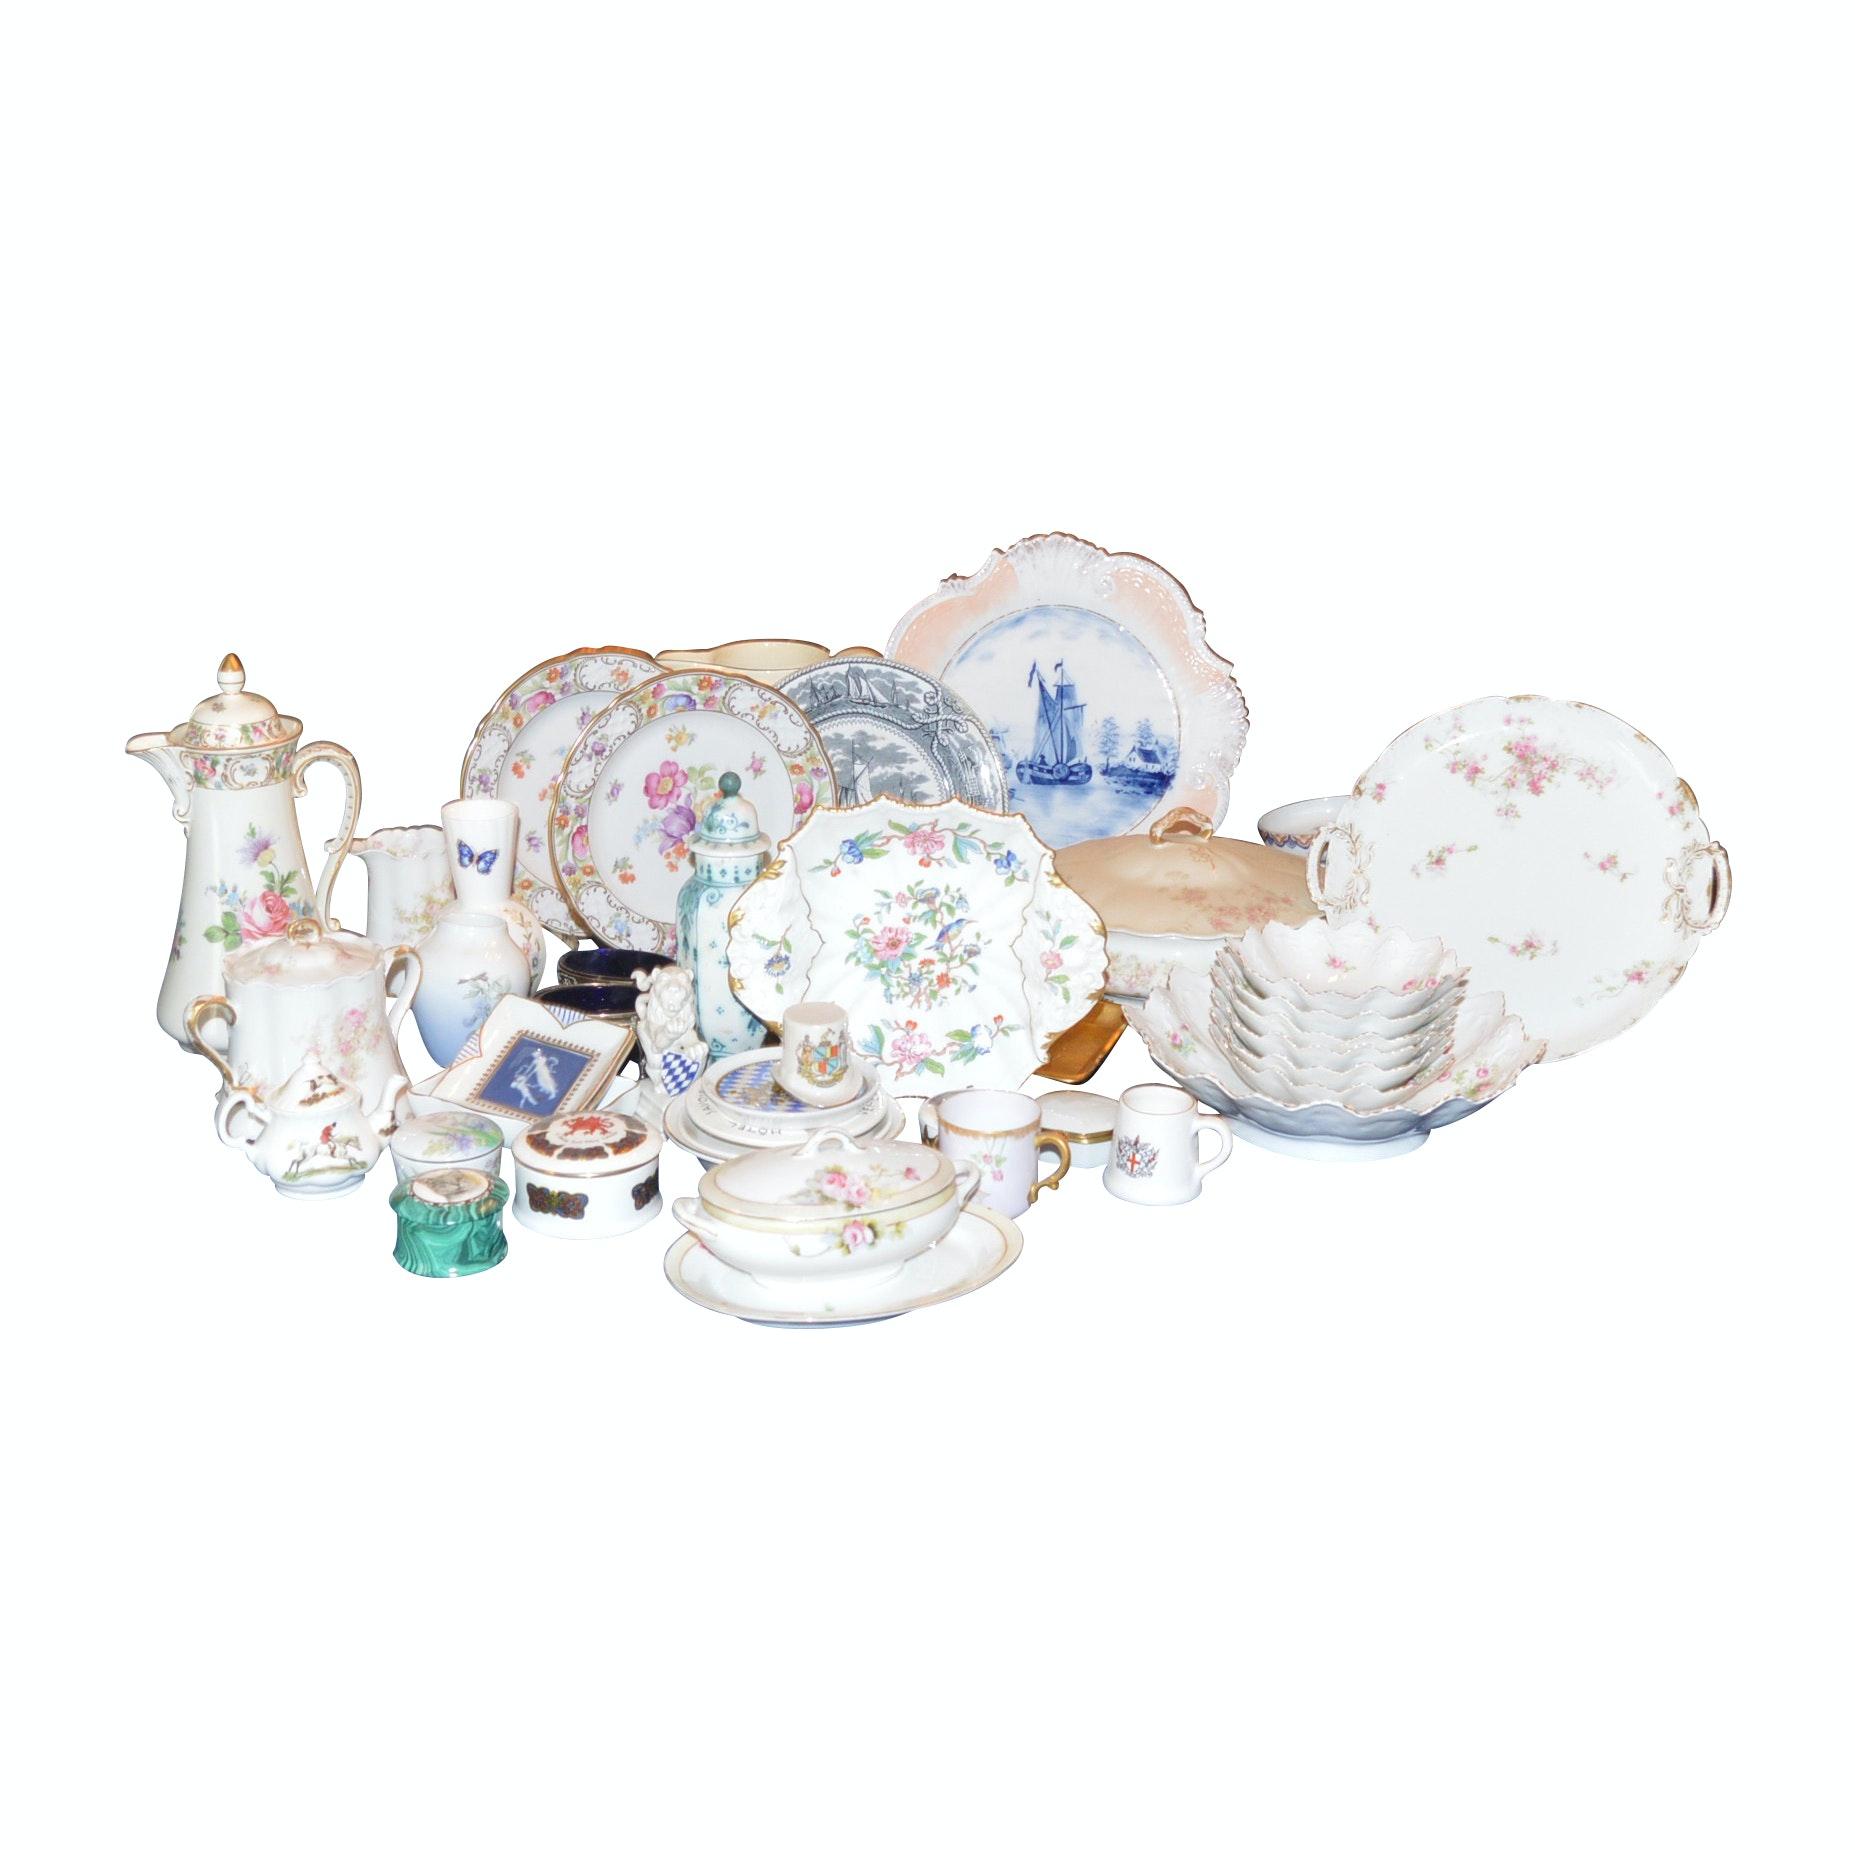 Mixed China Collection